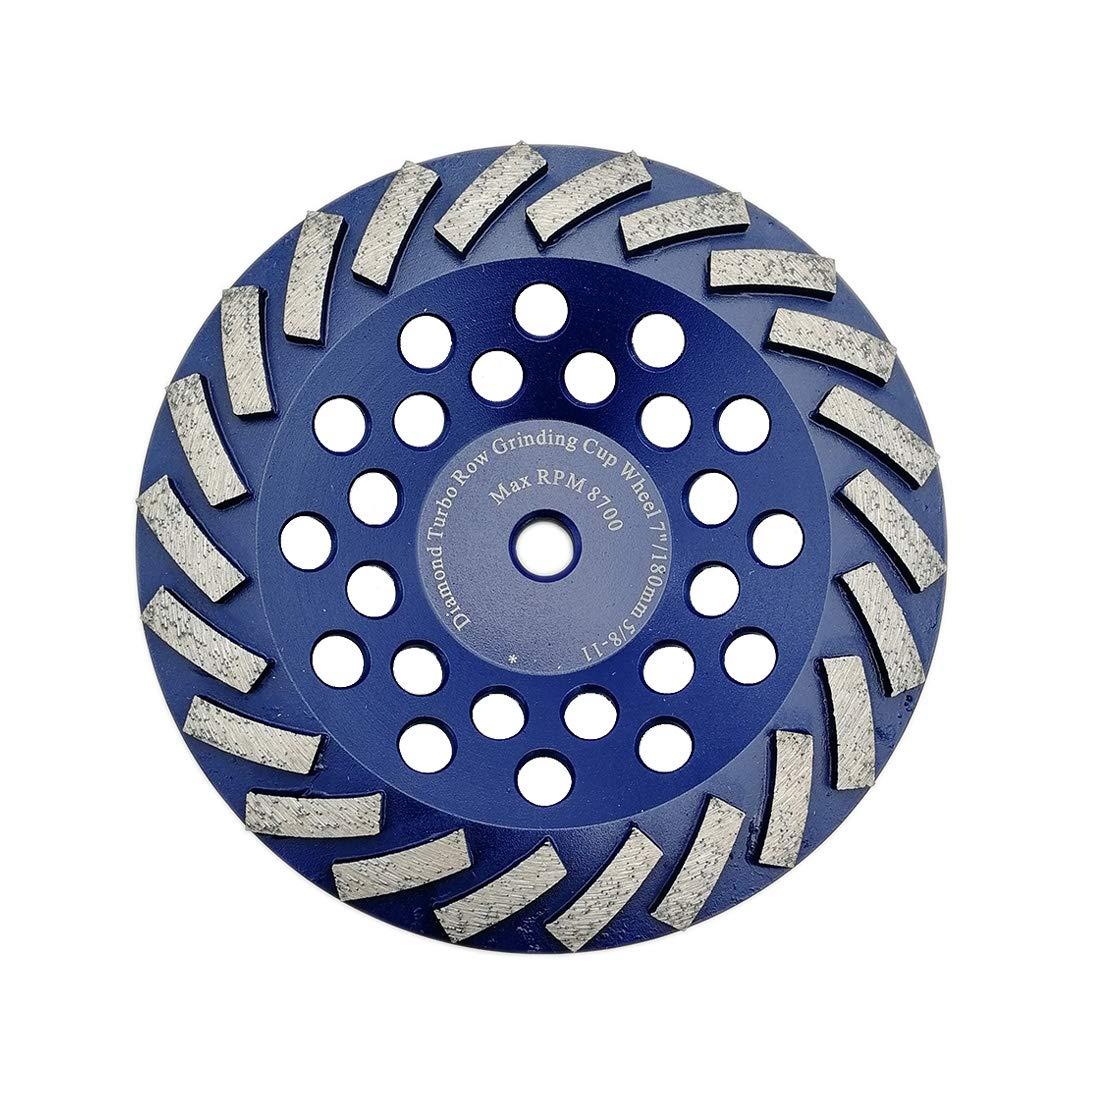 DT-DIATOOL 7 Inch Concrete Grinding Wheel Granite Marble with Turbo Row Diamond Segment